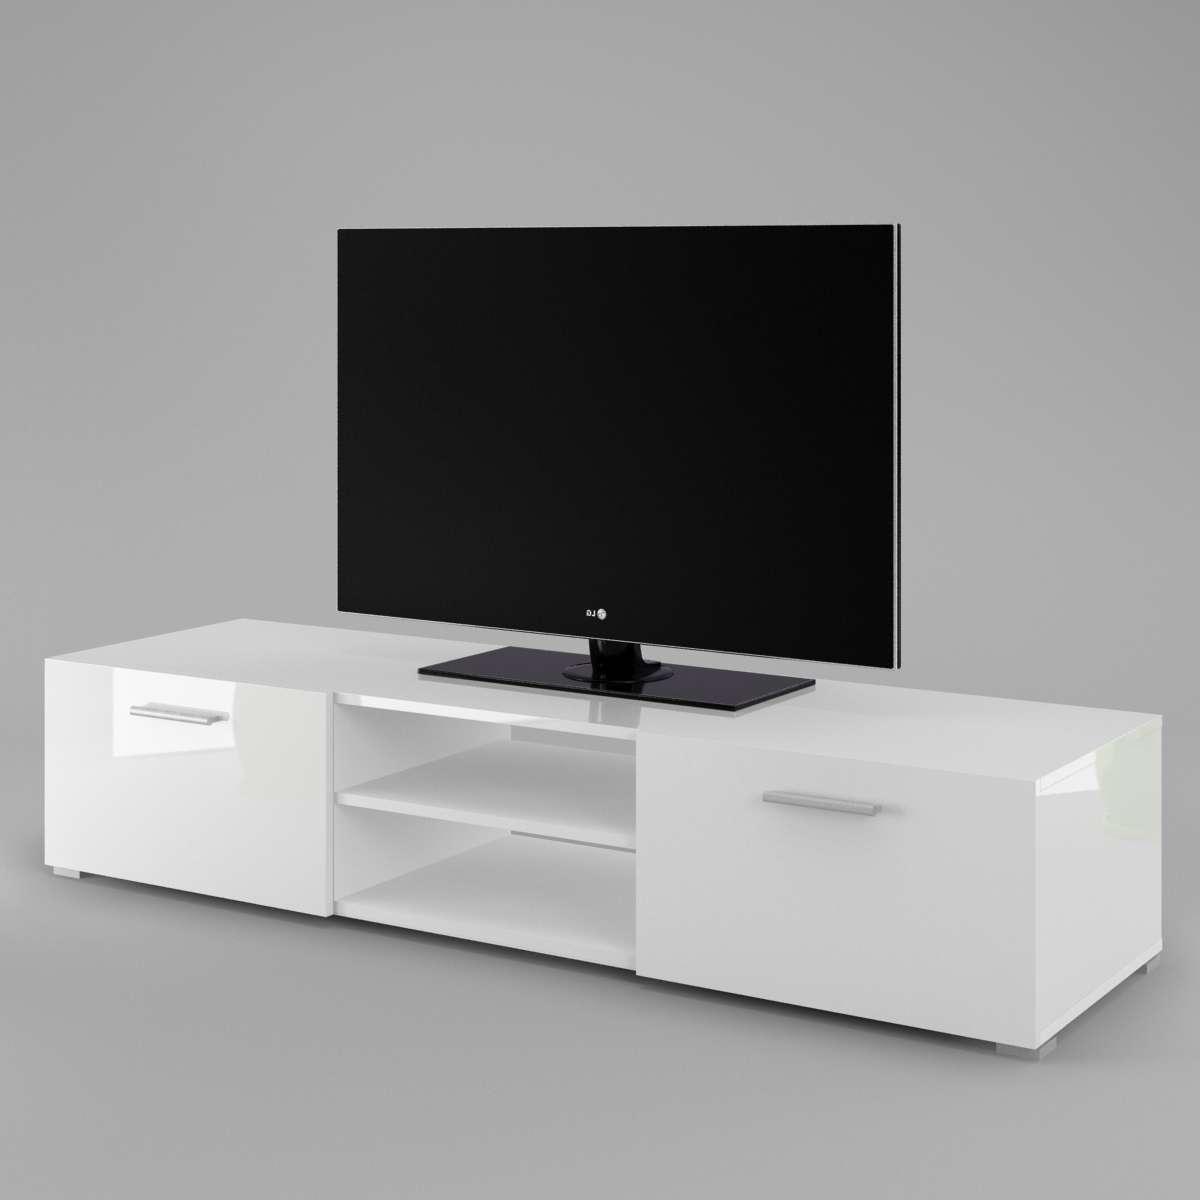 Tv Cabinet Luna – Labi Furniturelabi Furniture With Tv Cabinets (View 15 of 20)